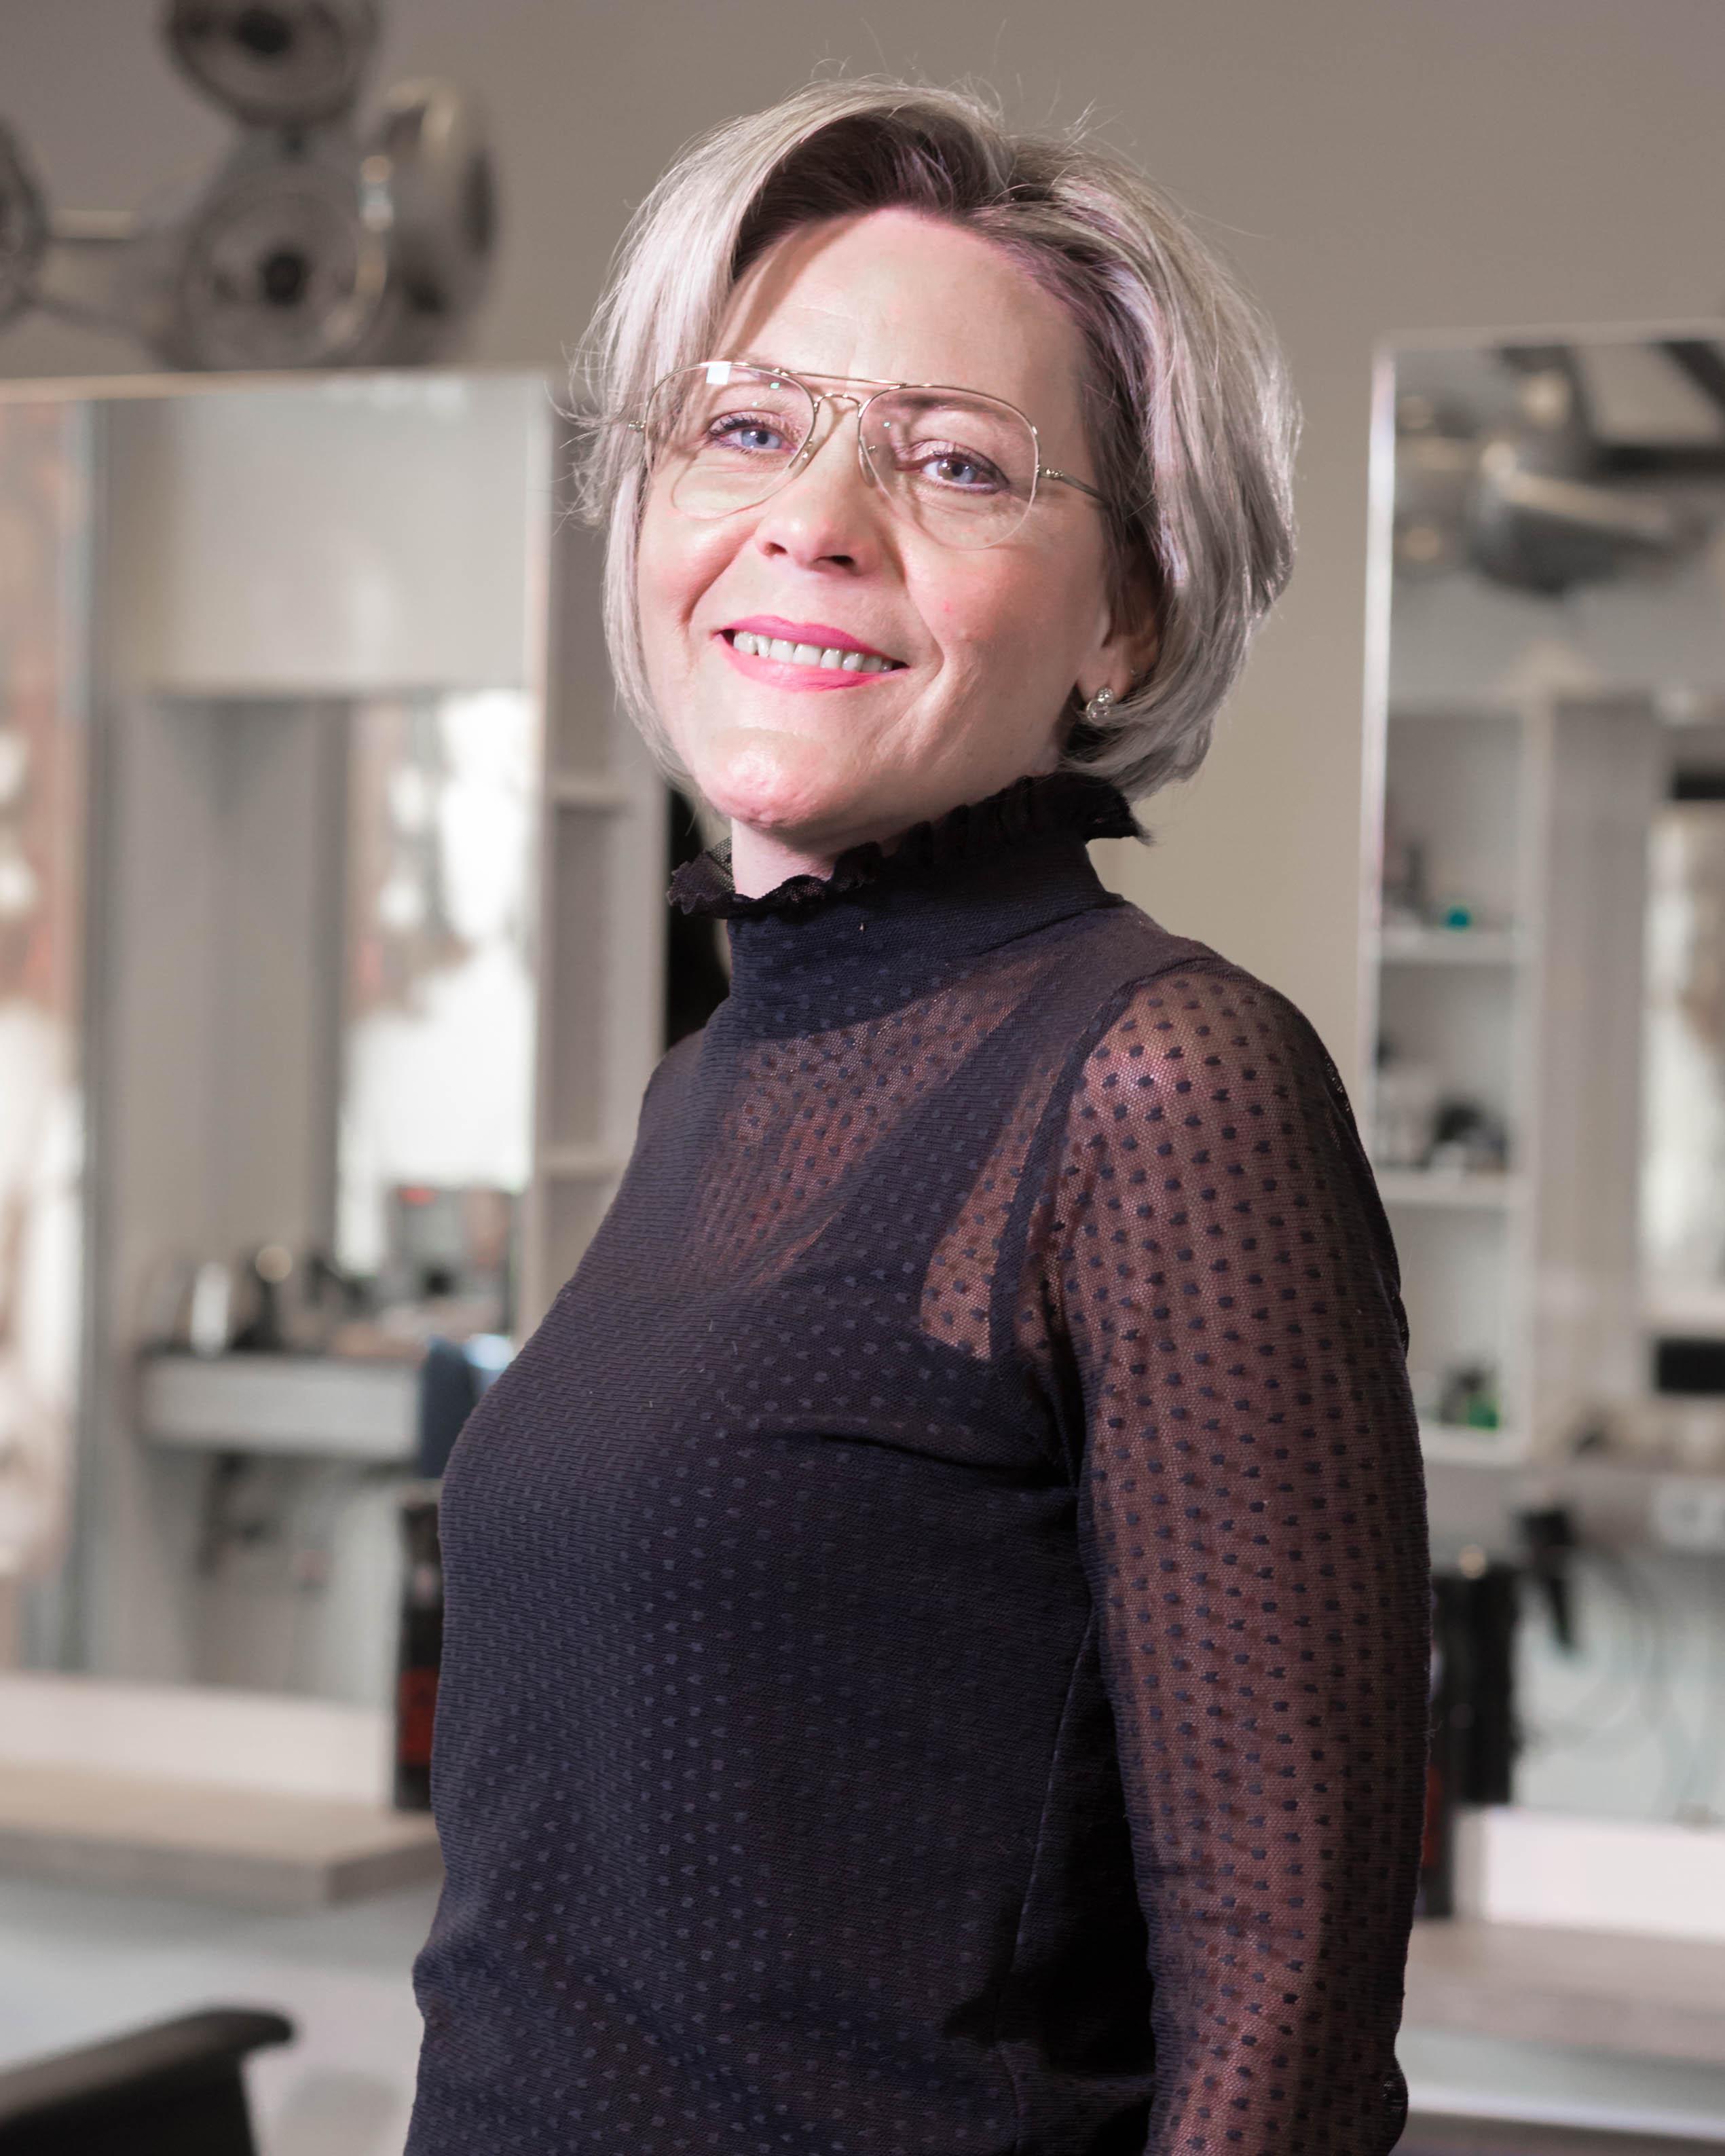 Hélène - Kapper bij Hairstyling Hélène Stellendam